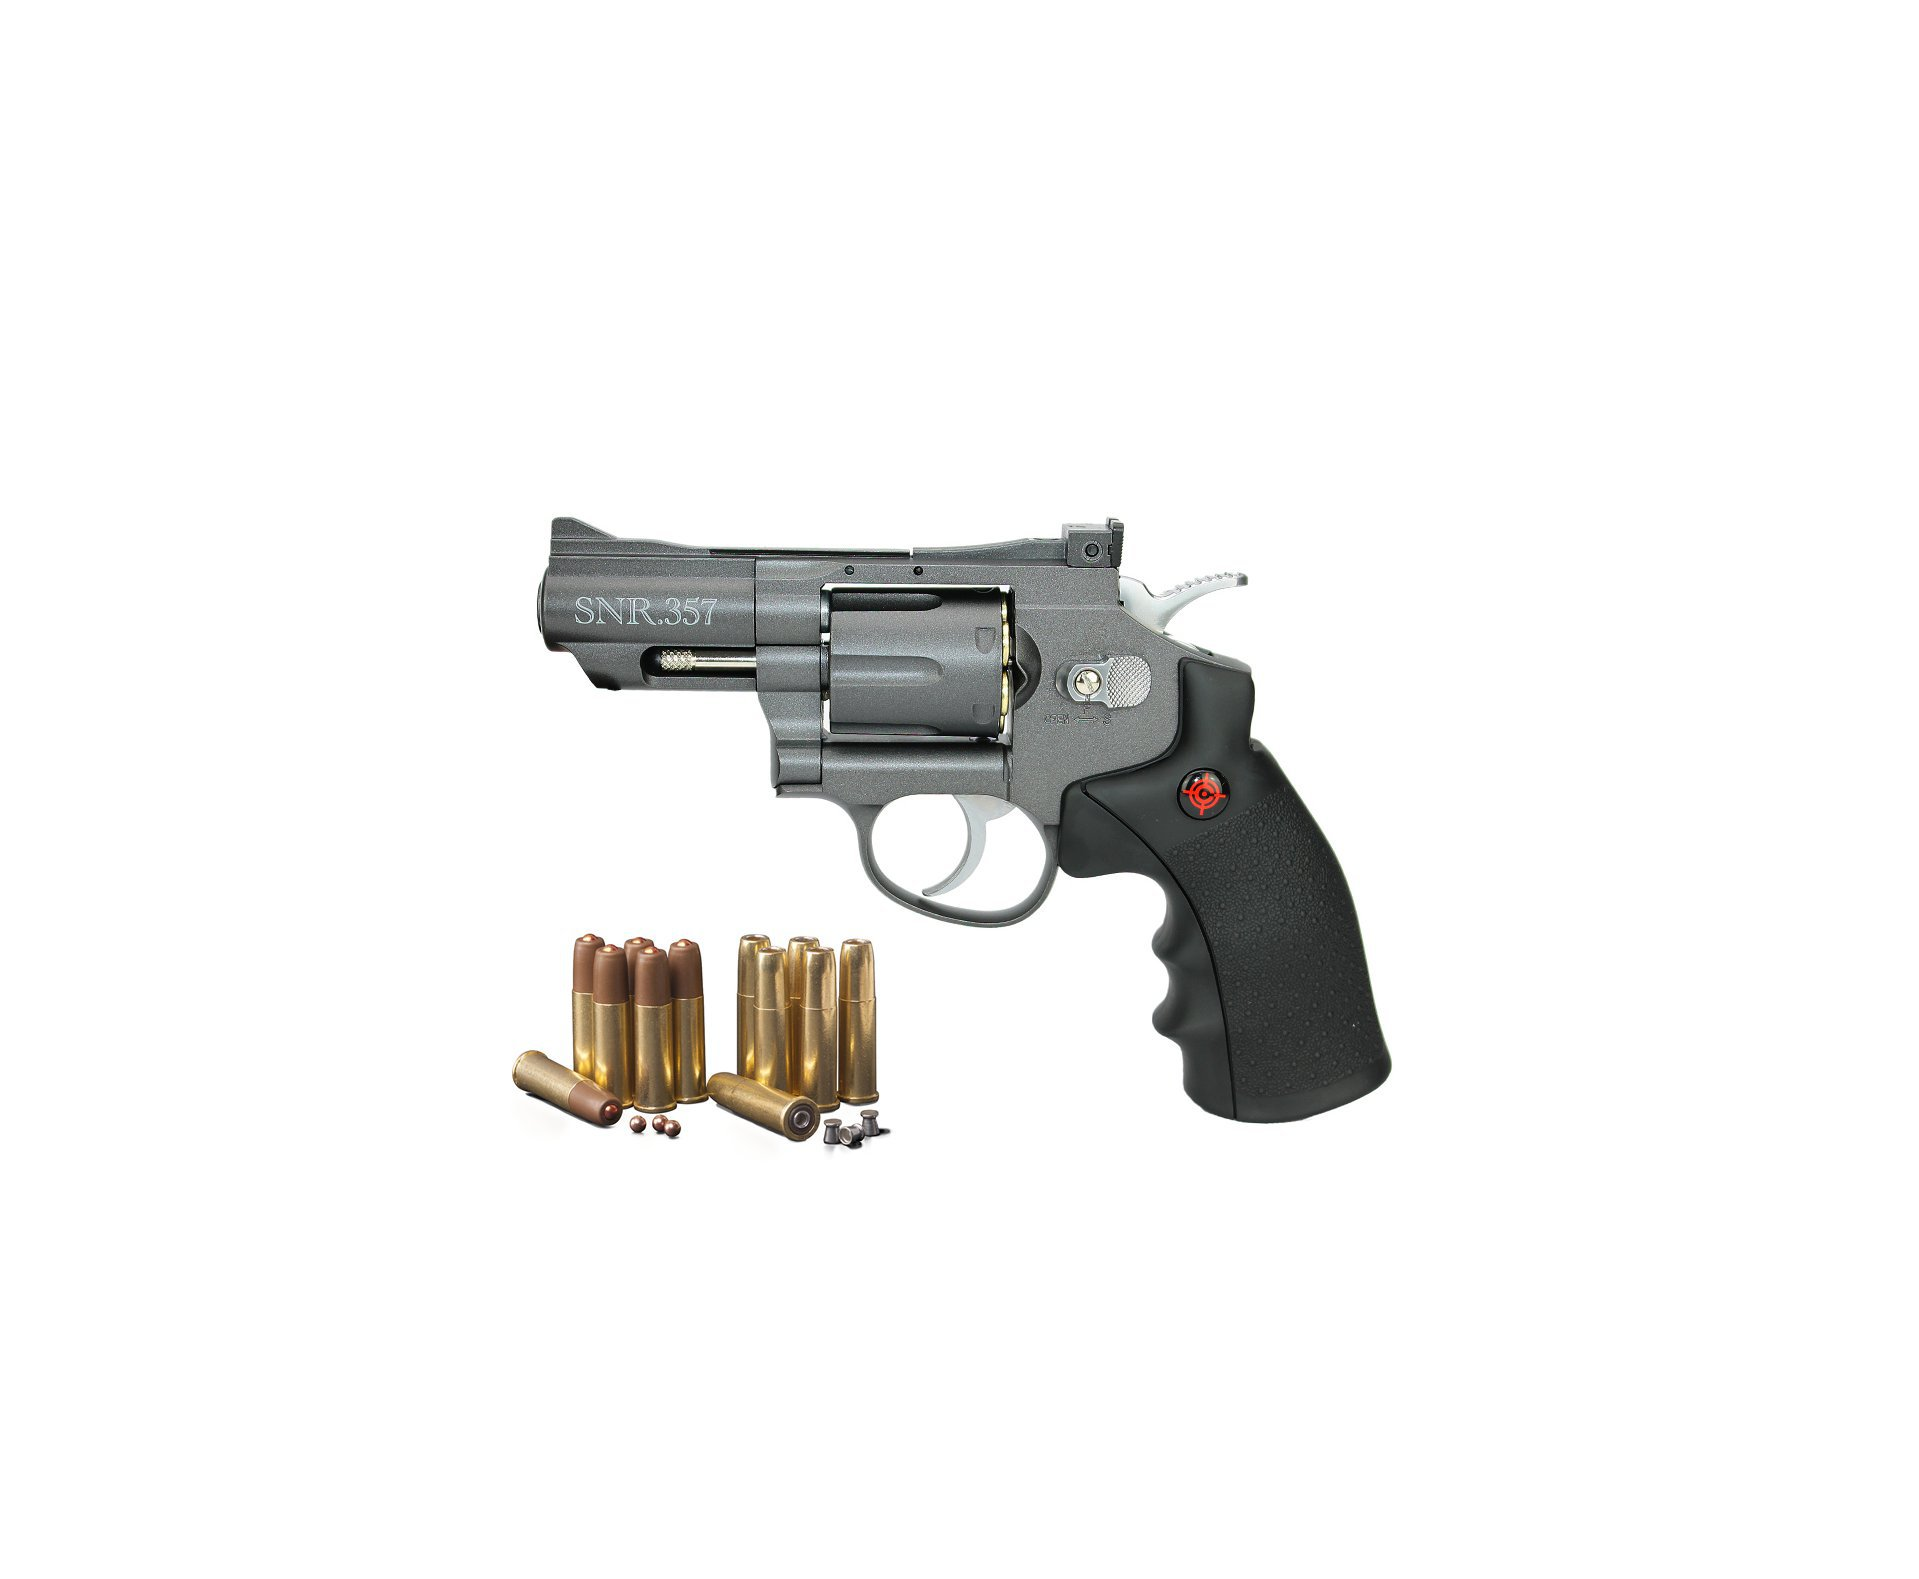 "Revolver Co2 Full Metal 2"" Cano Snr357 Cal 4,5mm Crosman + Maleta + Munição + Co2"